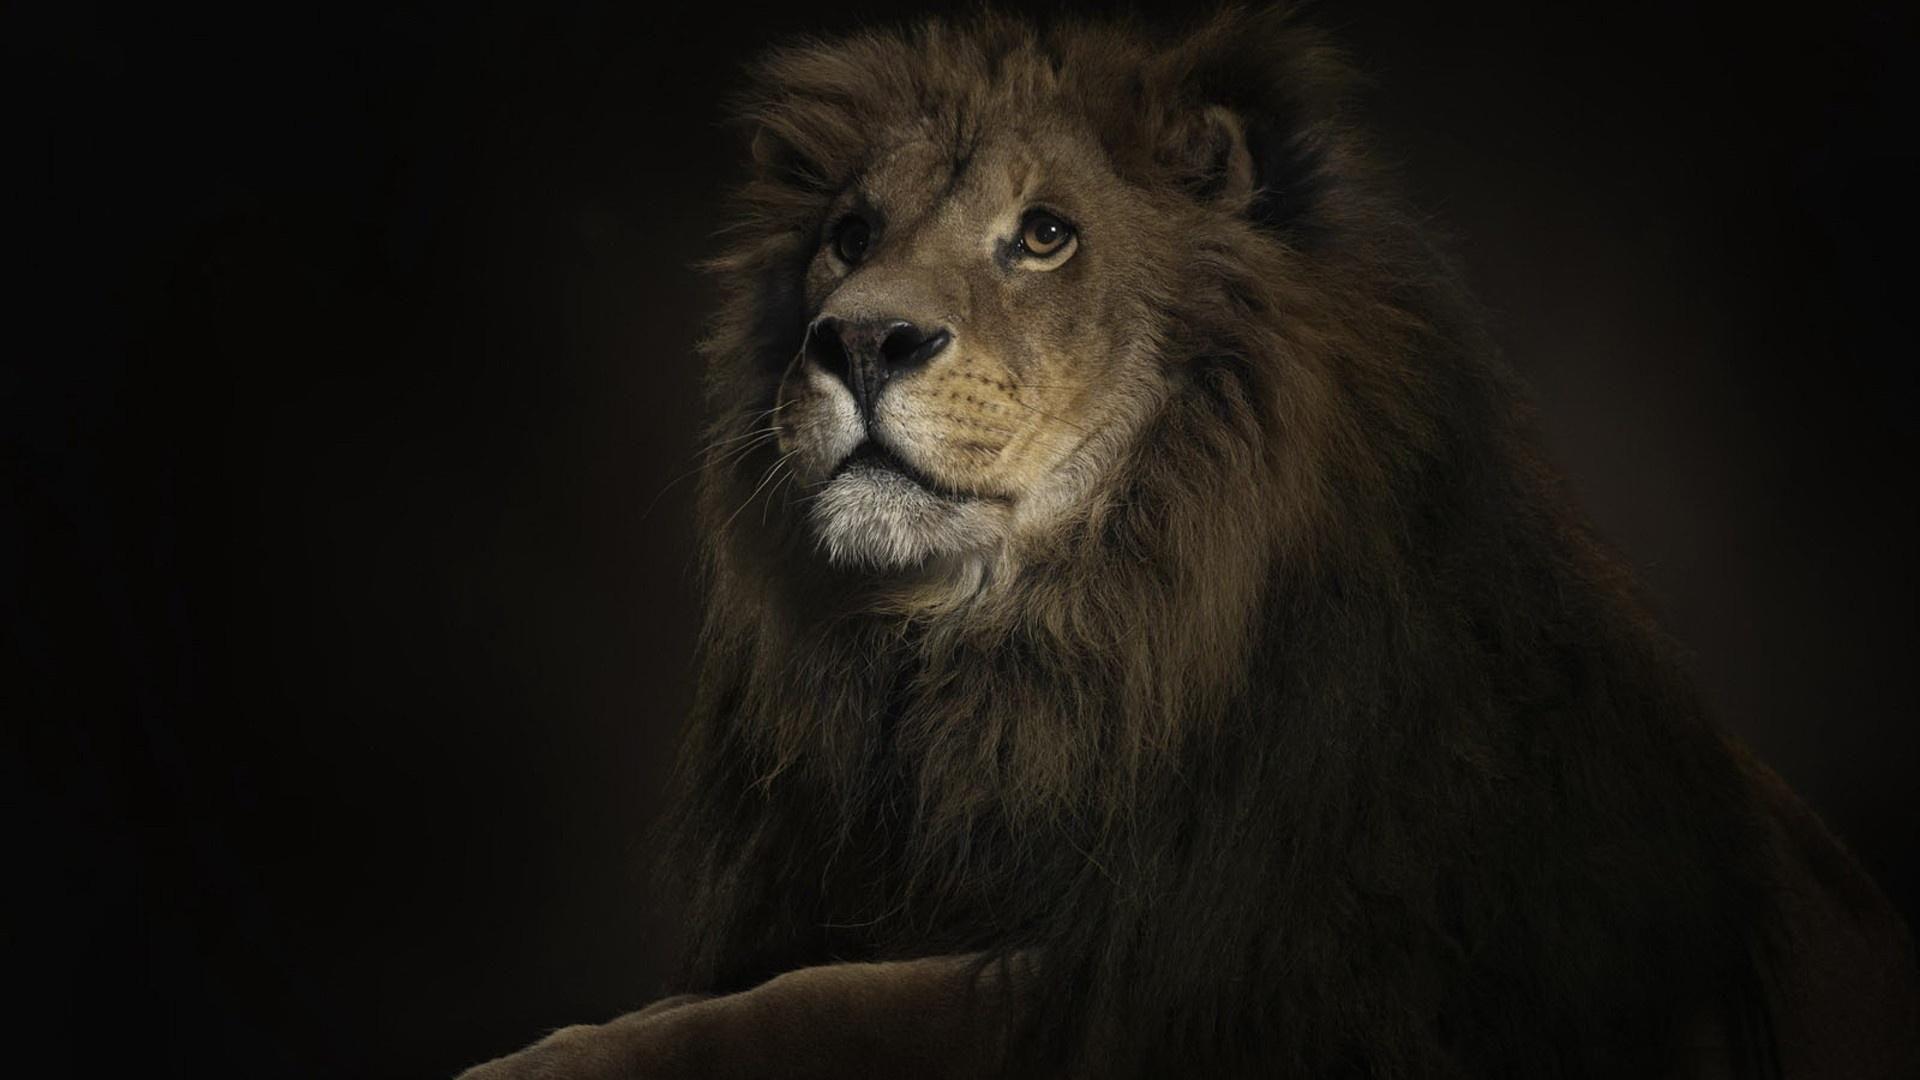 black lion wallpaper hd wallpaper wallpapers pinterest lion